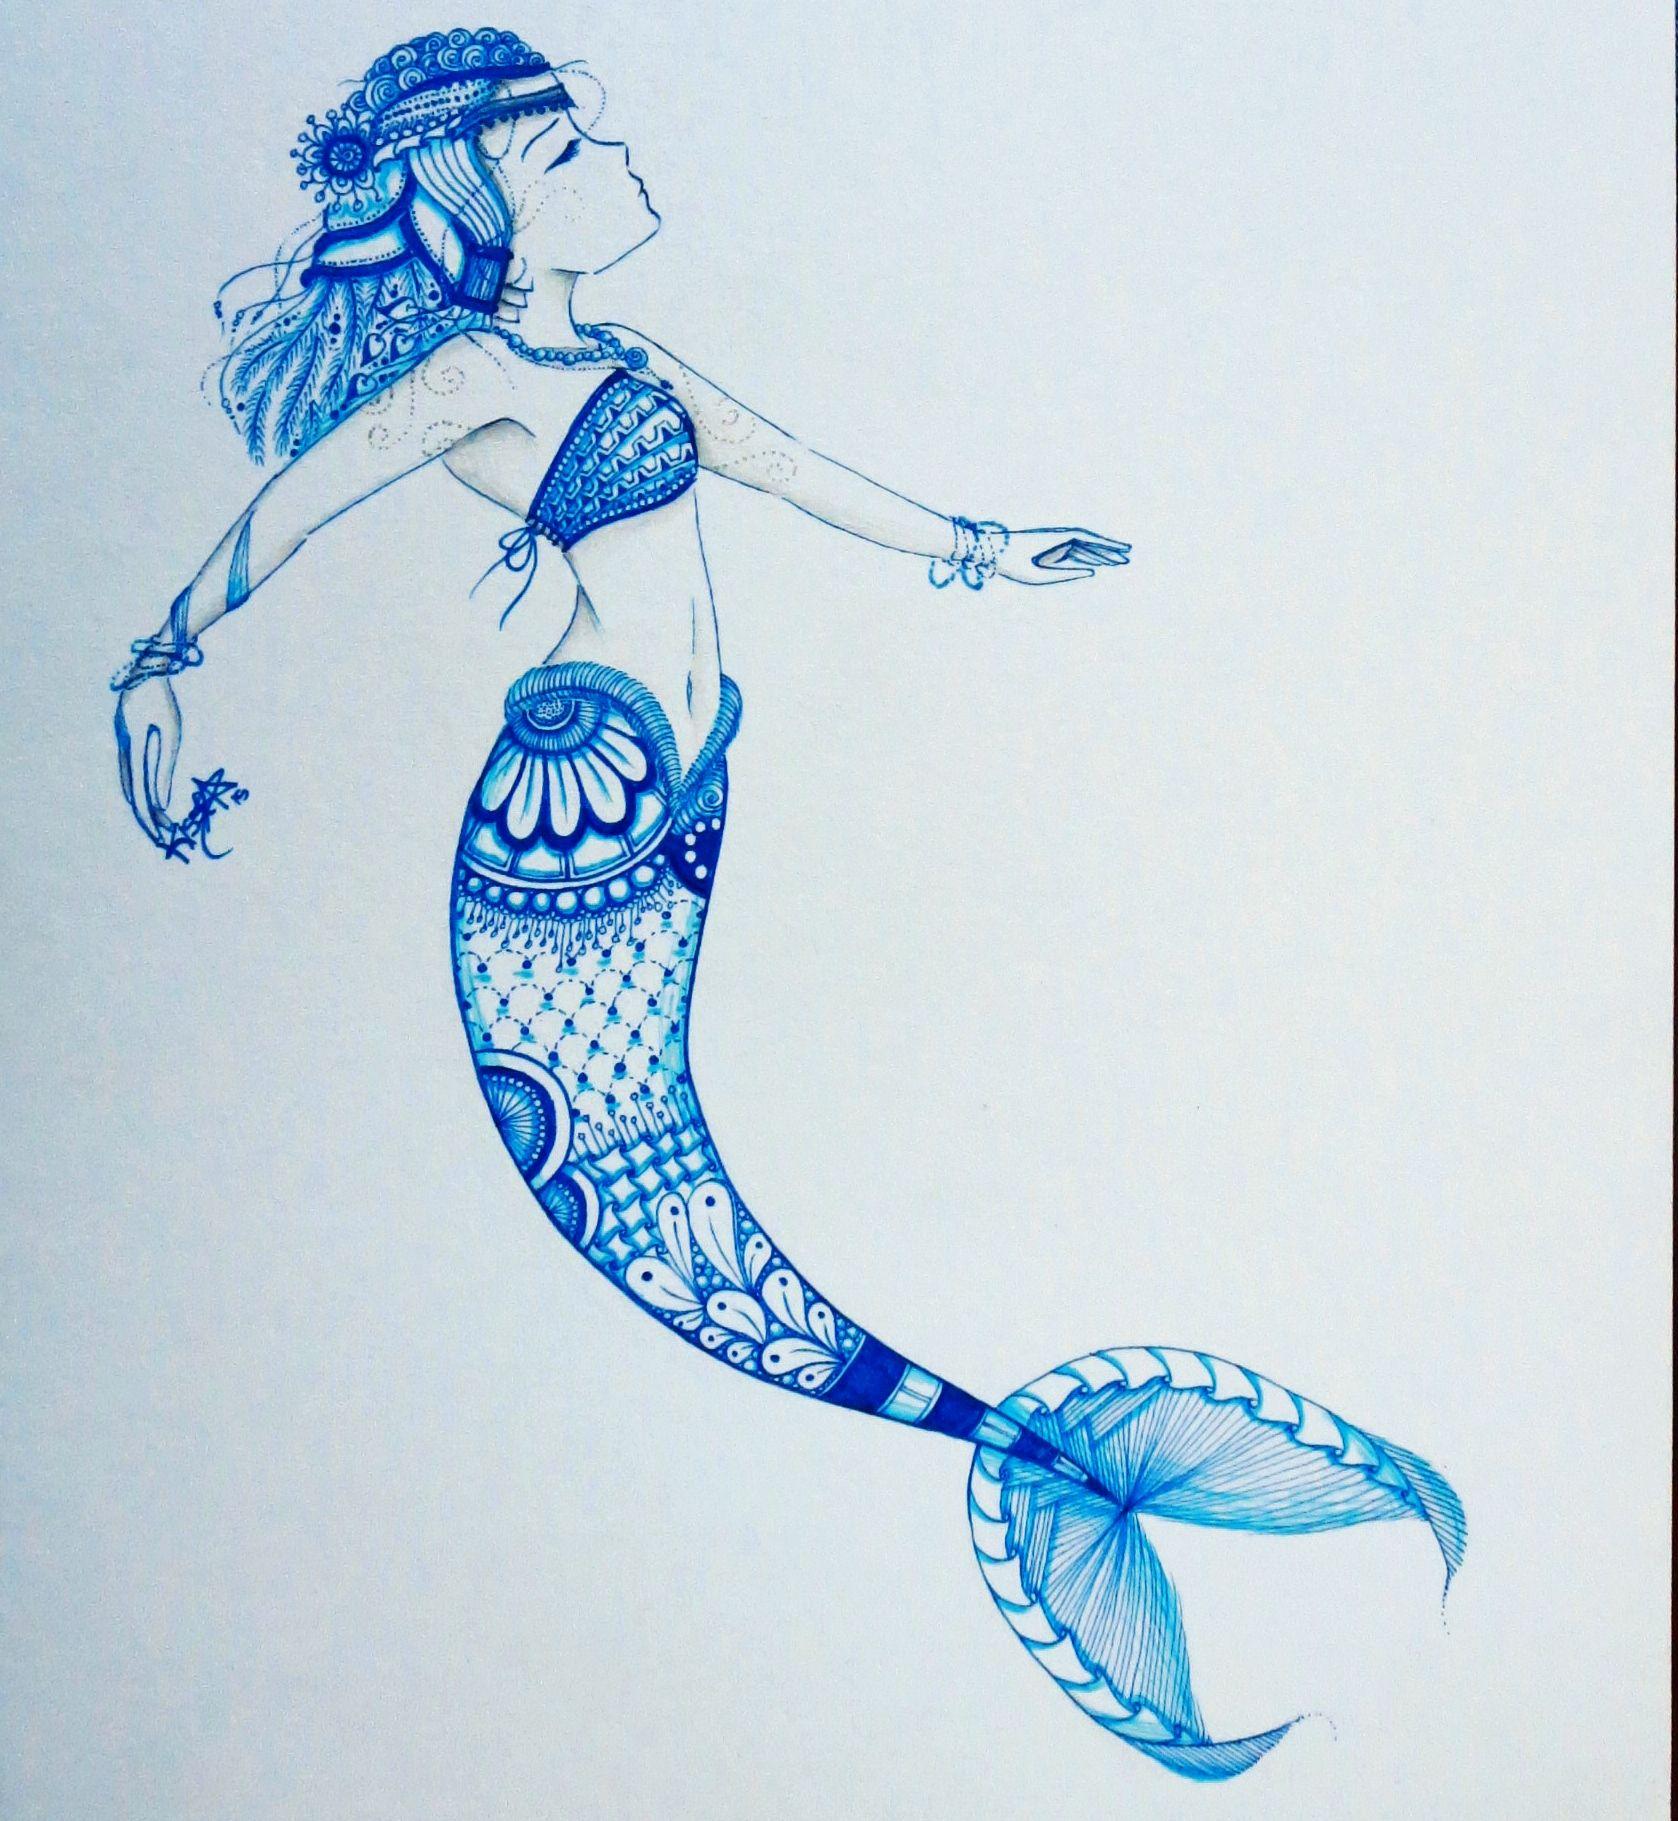 zentangle mermaid | OUR ART | Pinterest